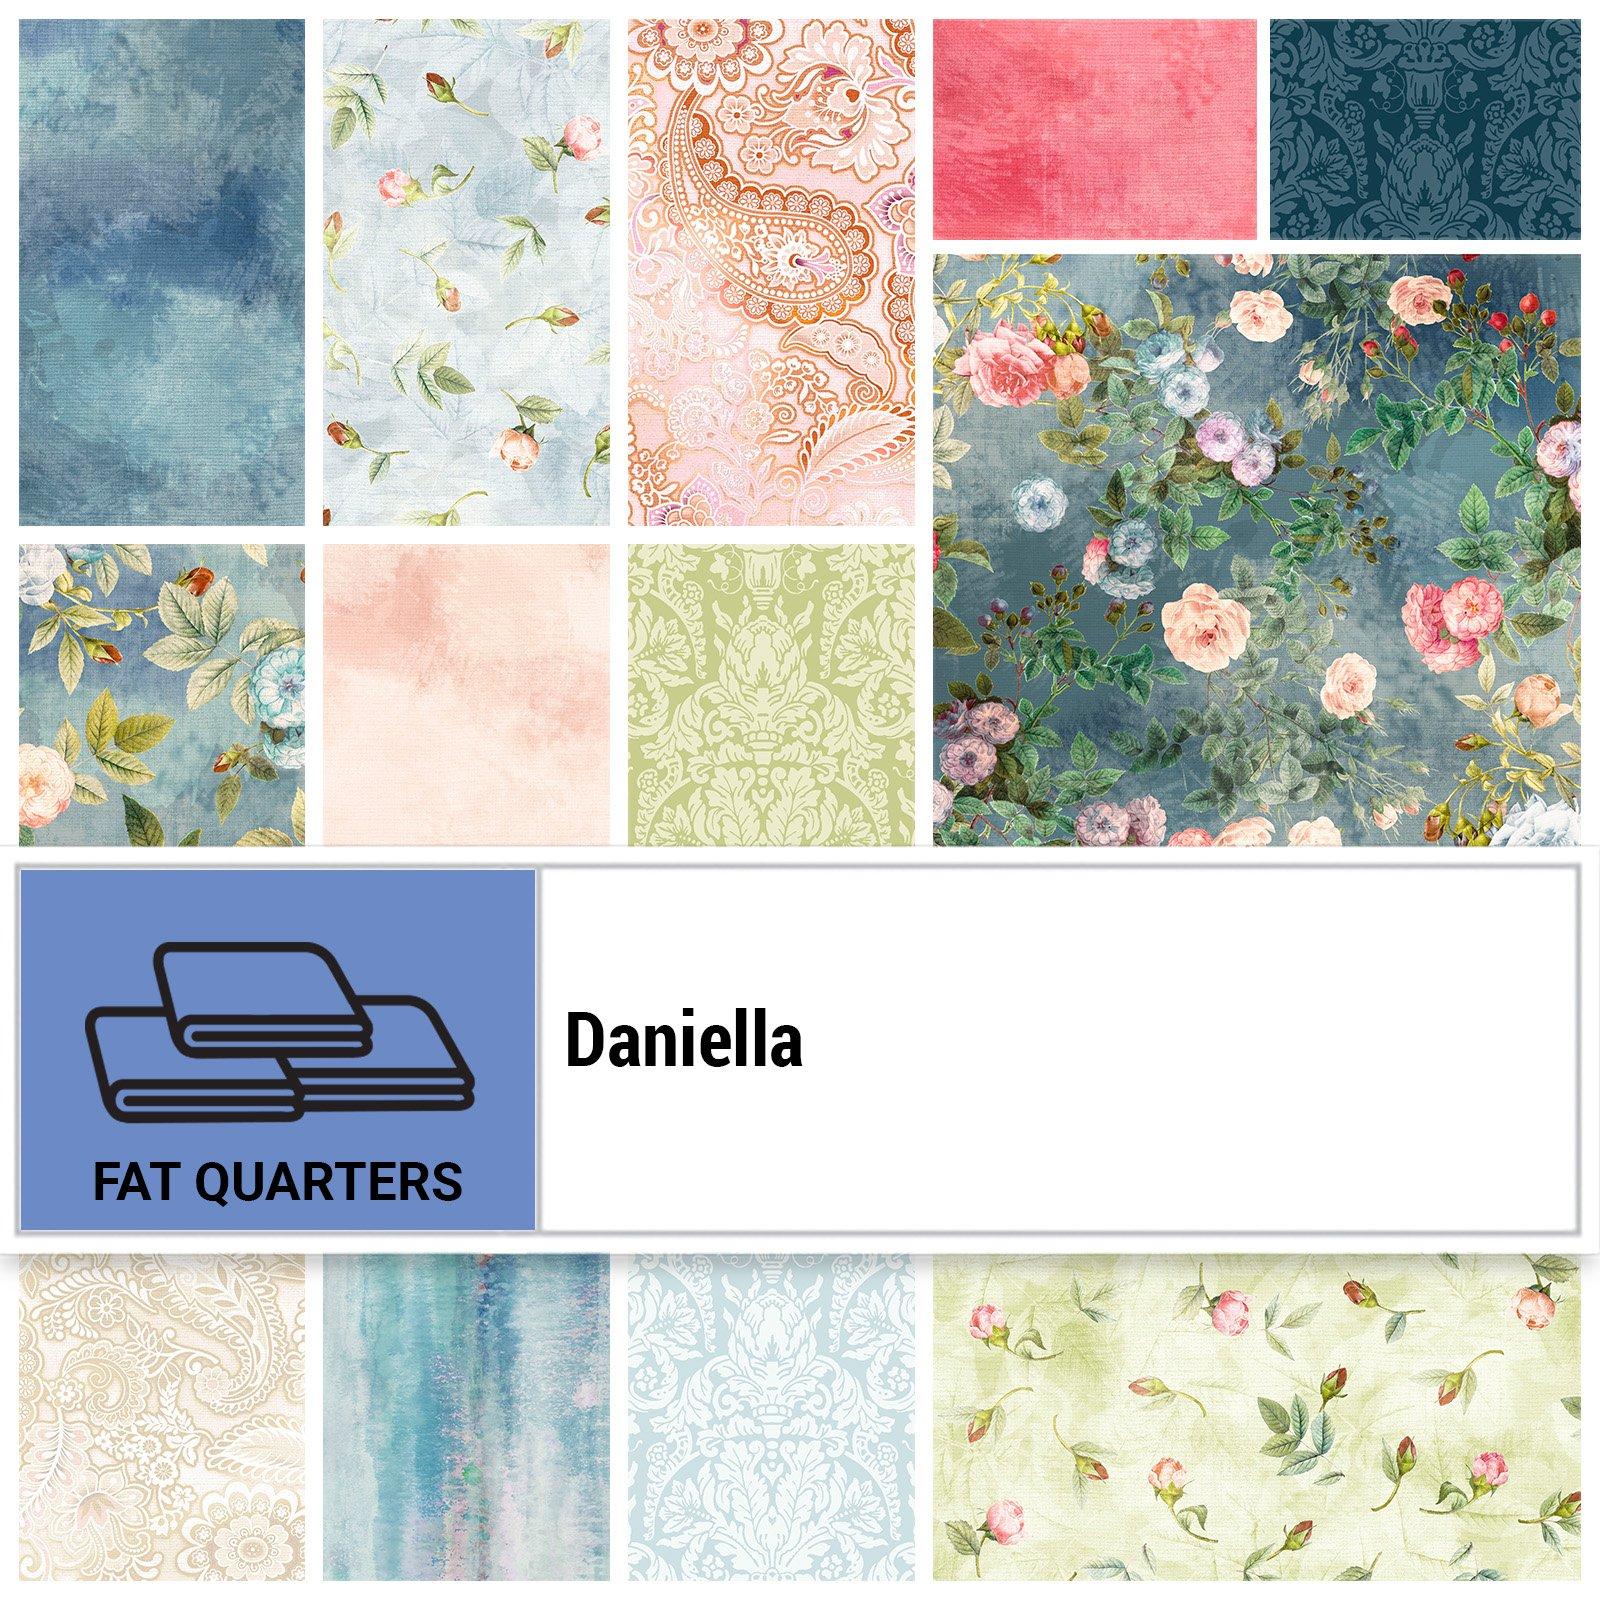 DANI-18X22 - DANIELLA FAT QUARTER BUNDLE BY P&B BOUTIQUE 14PCS - ARRIVING IN OCTOBER 2021